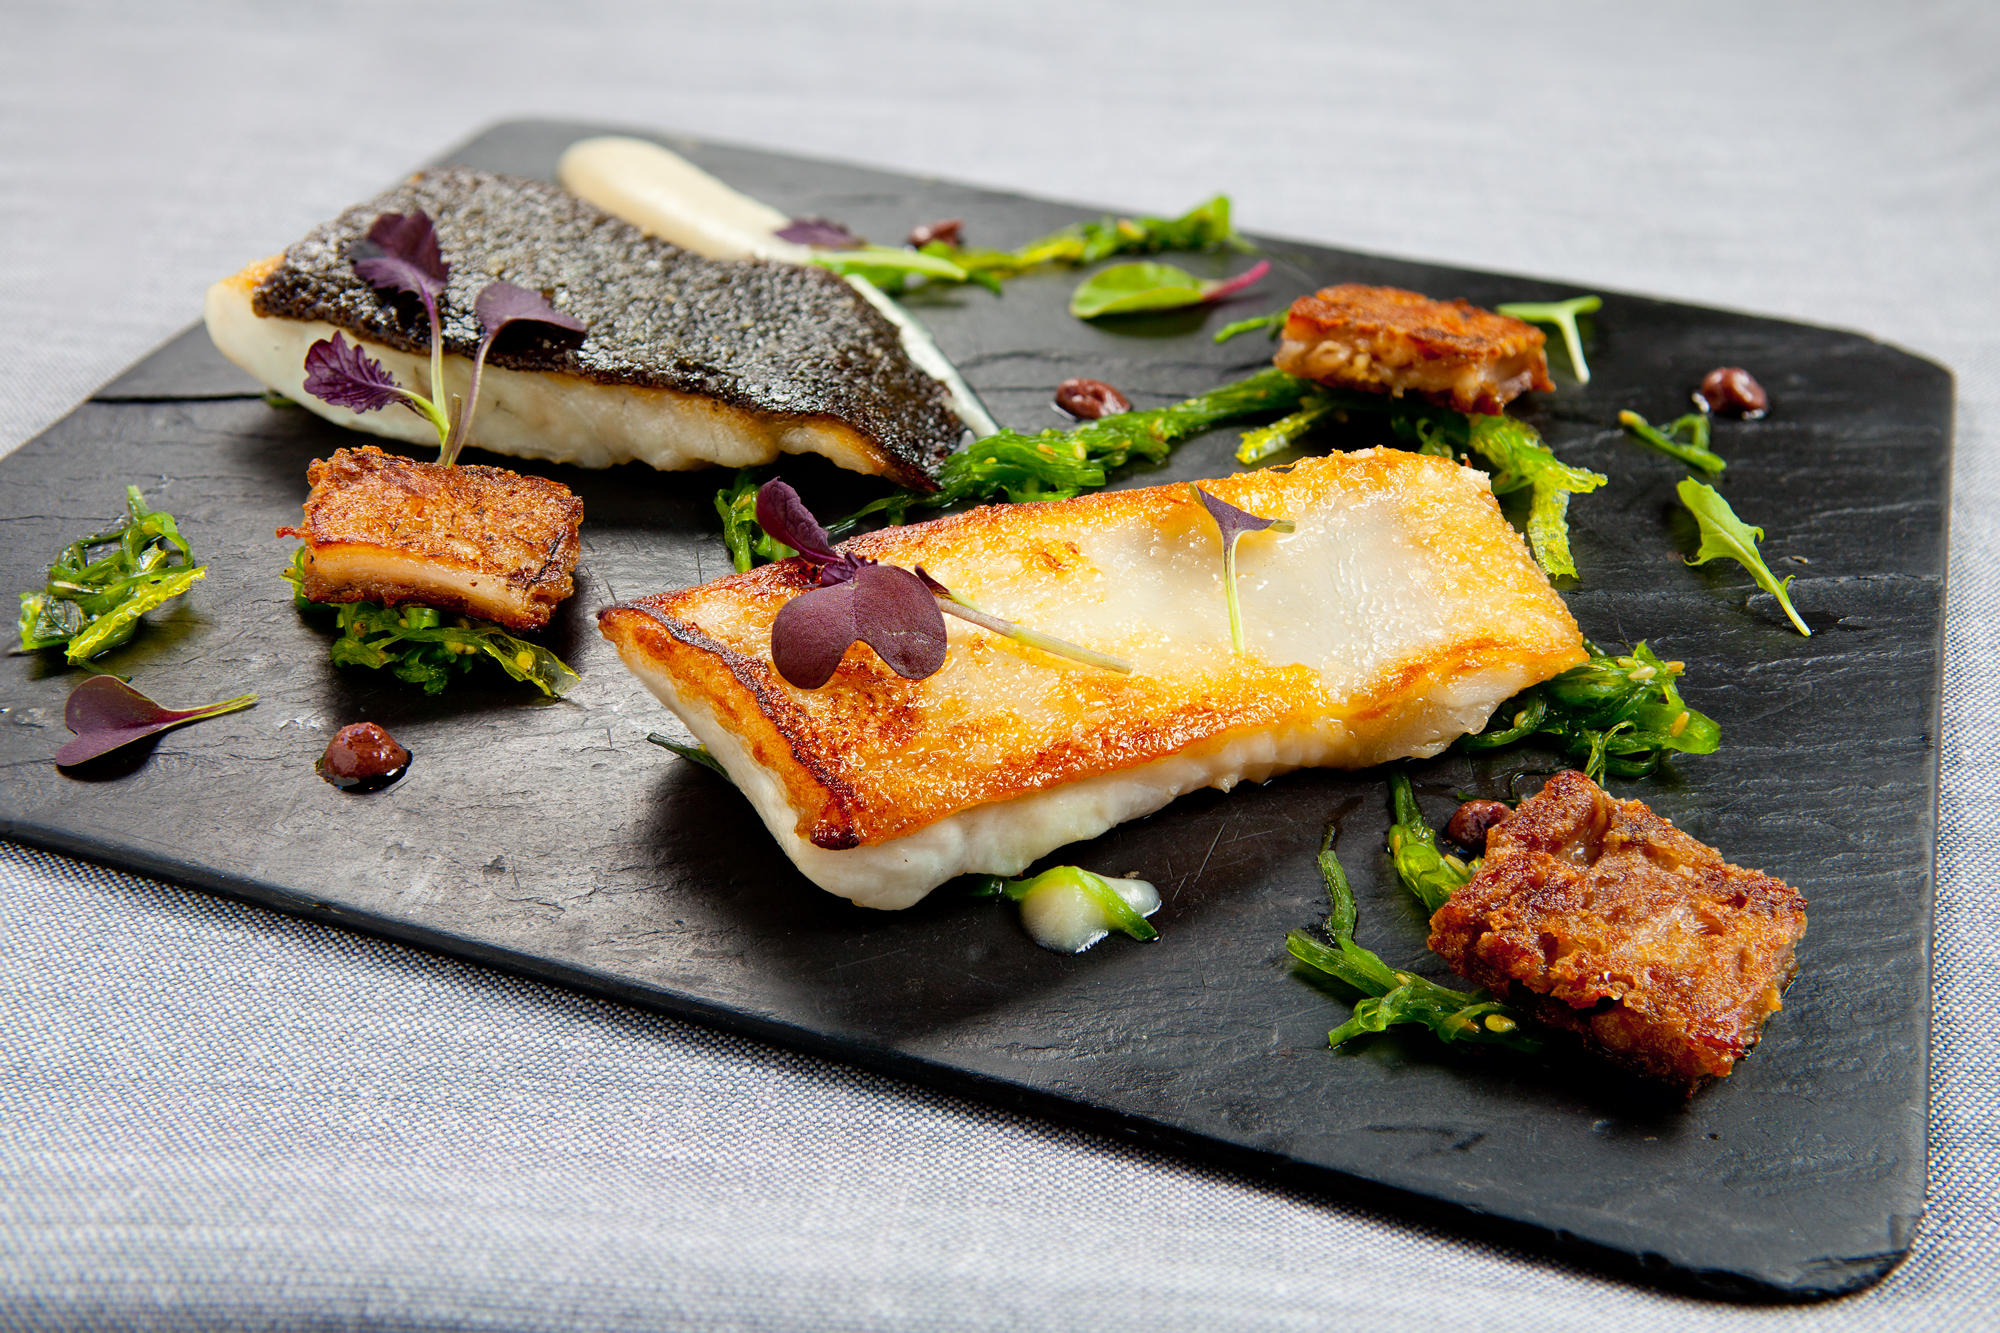 Restaurante-loidi-barcelona-martin-berasategui-menu-sant-jordi-2018-1